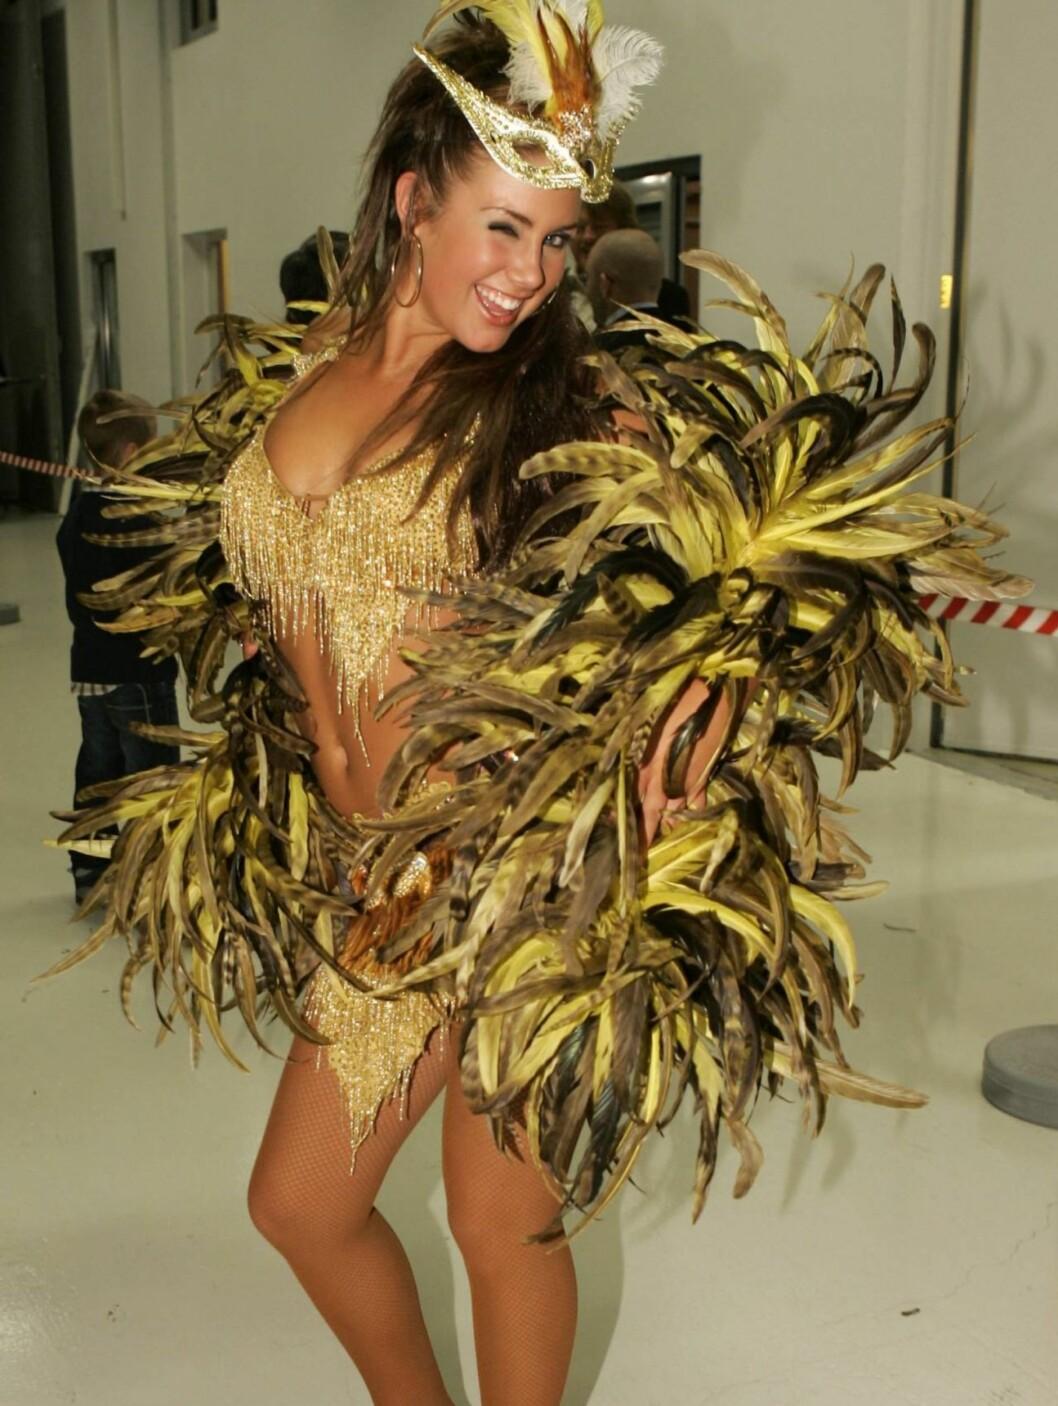 FJÆRPRYD: Artisten kom på tredjeplass i «Skal vi danse» i 2006.  Foto: Geir Egil Skog, frilansfoto.no